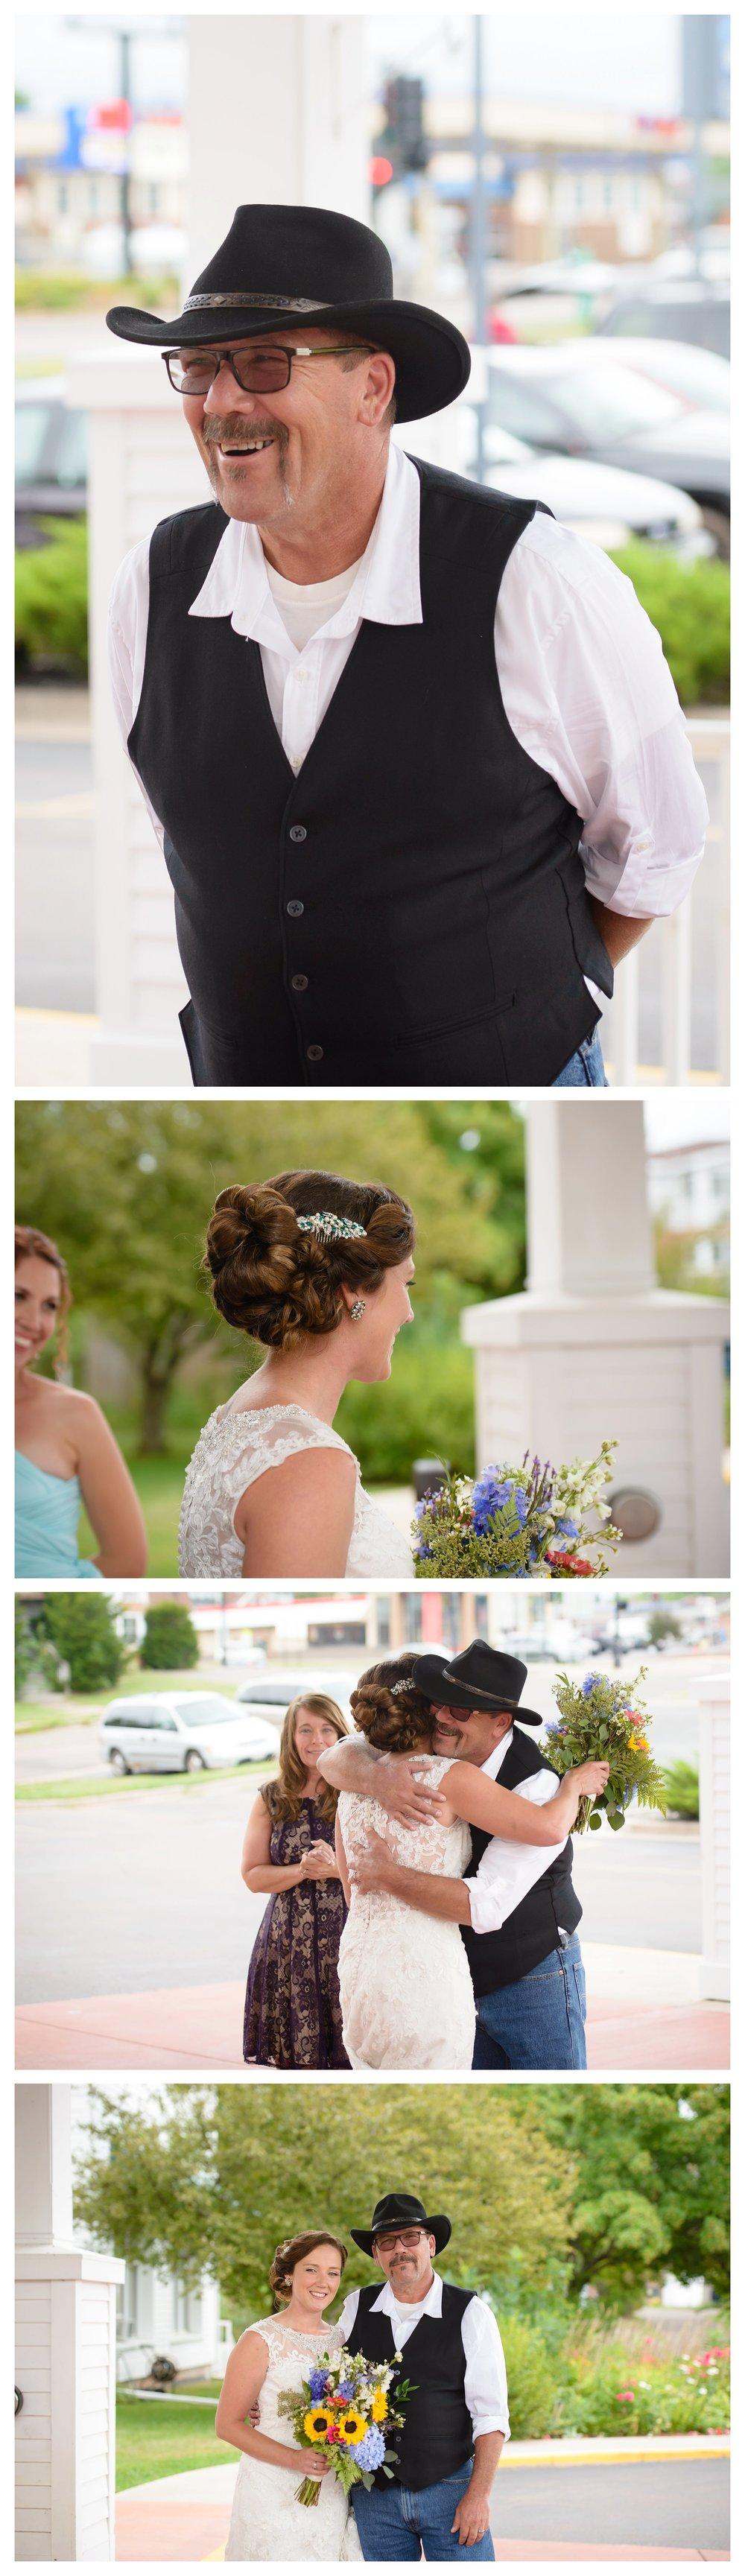 ps 139 photography jen jensen ashland freehands farm wedding northwoods_0027.jpg